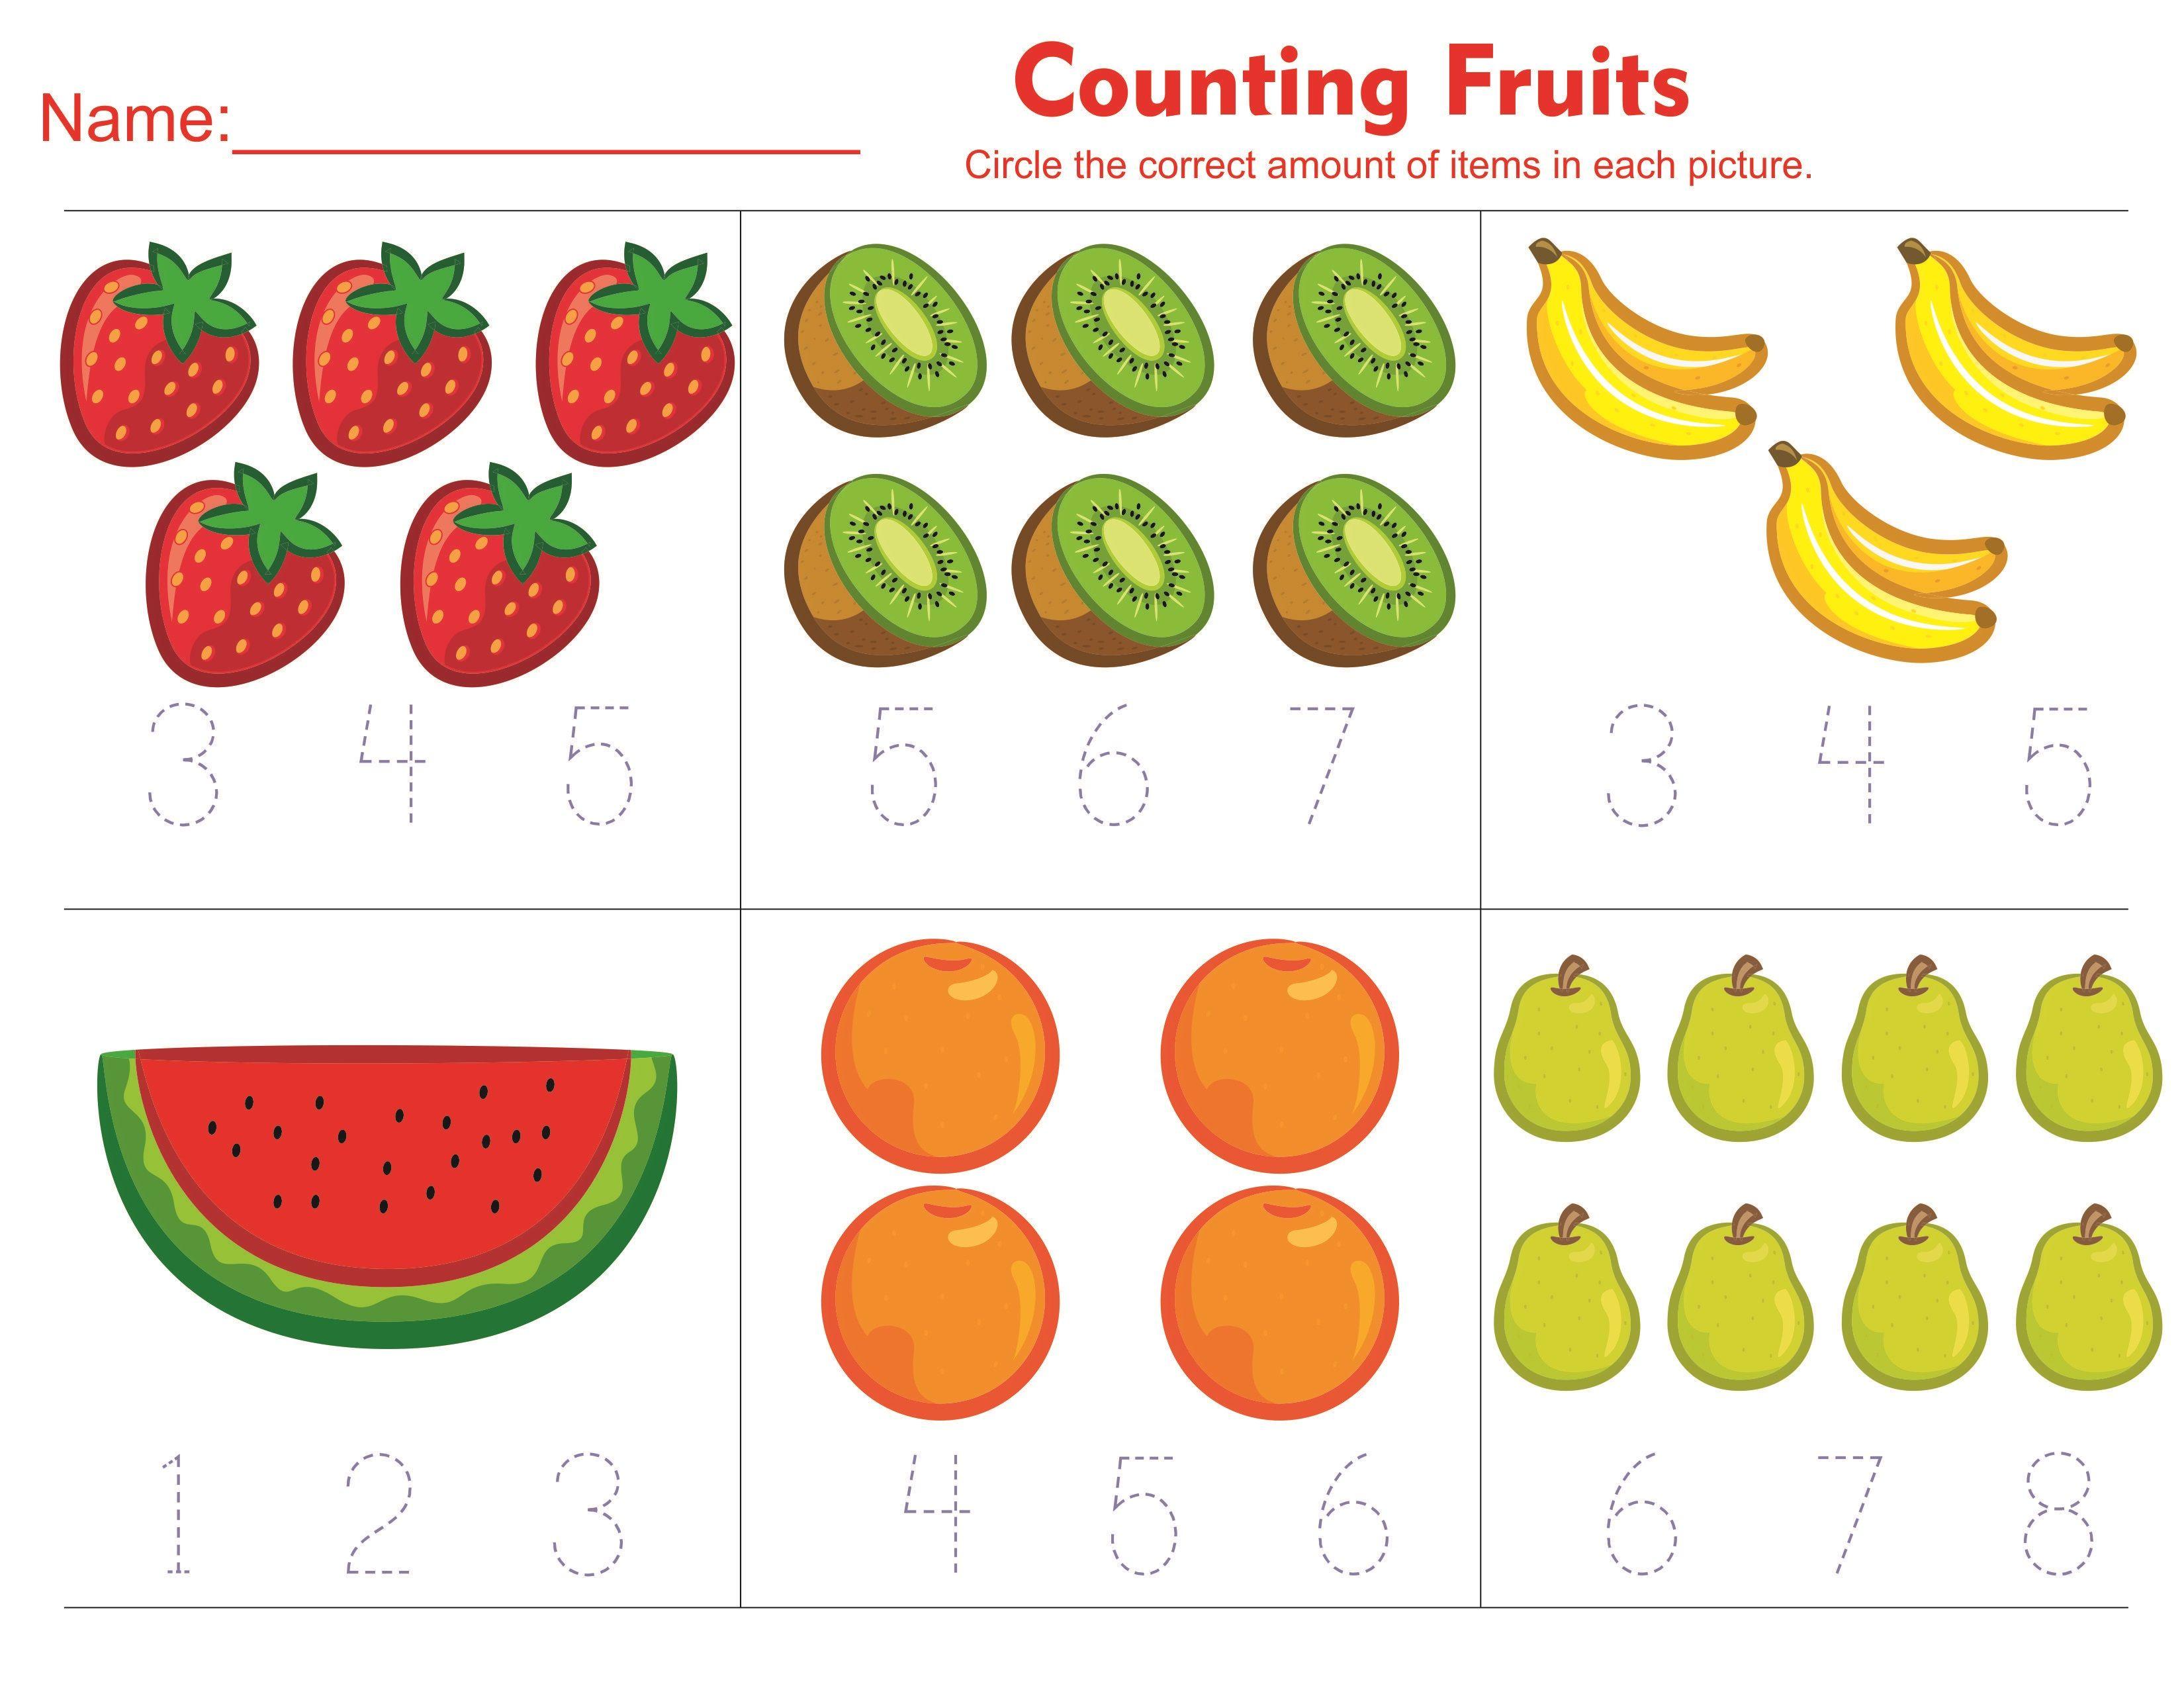 Toddler Counting Fruits Activity Worksheets Free 2019 Educative Printable Free Preschool Worksheets Preschool Math Worksheets Tracing Worksheets Preschool [ 2550 x 3300 Pixel ]